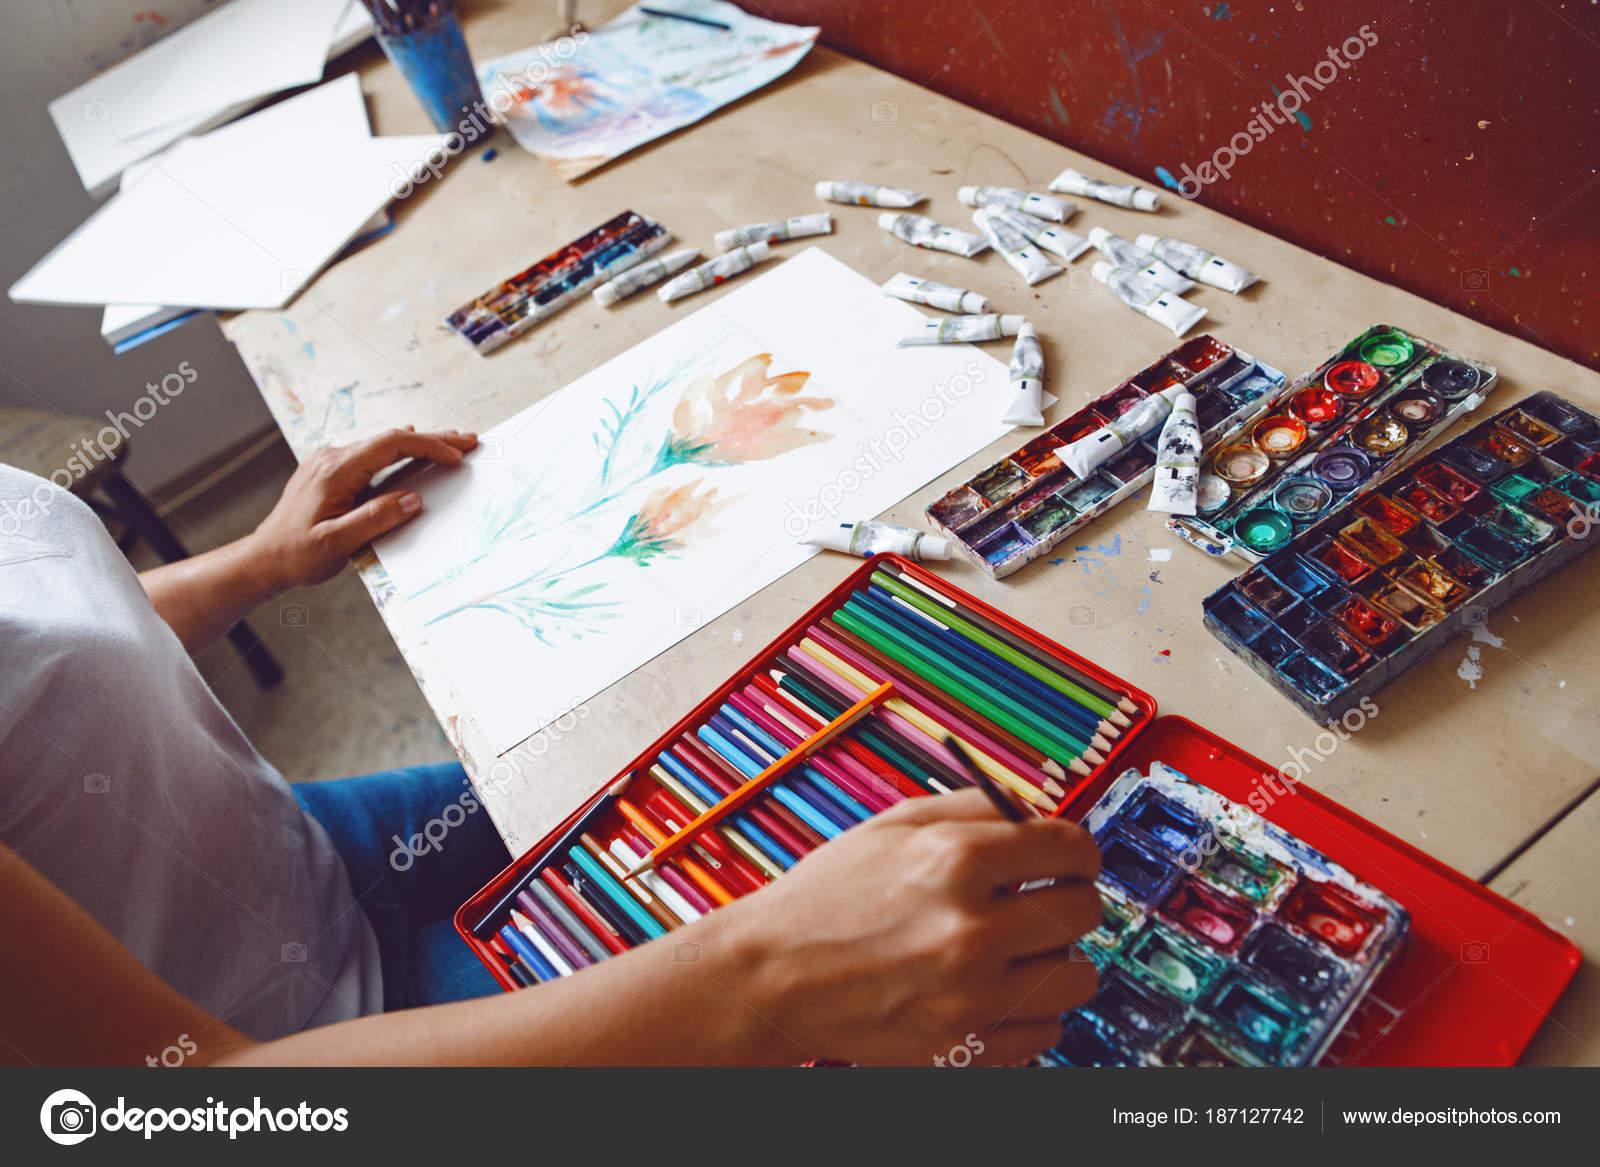 Detailni Zaber Bile Kavkazskych Kreslirce Kresleni Malovani Akvarelu